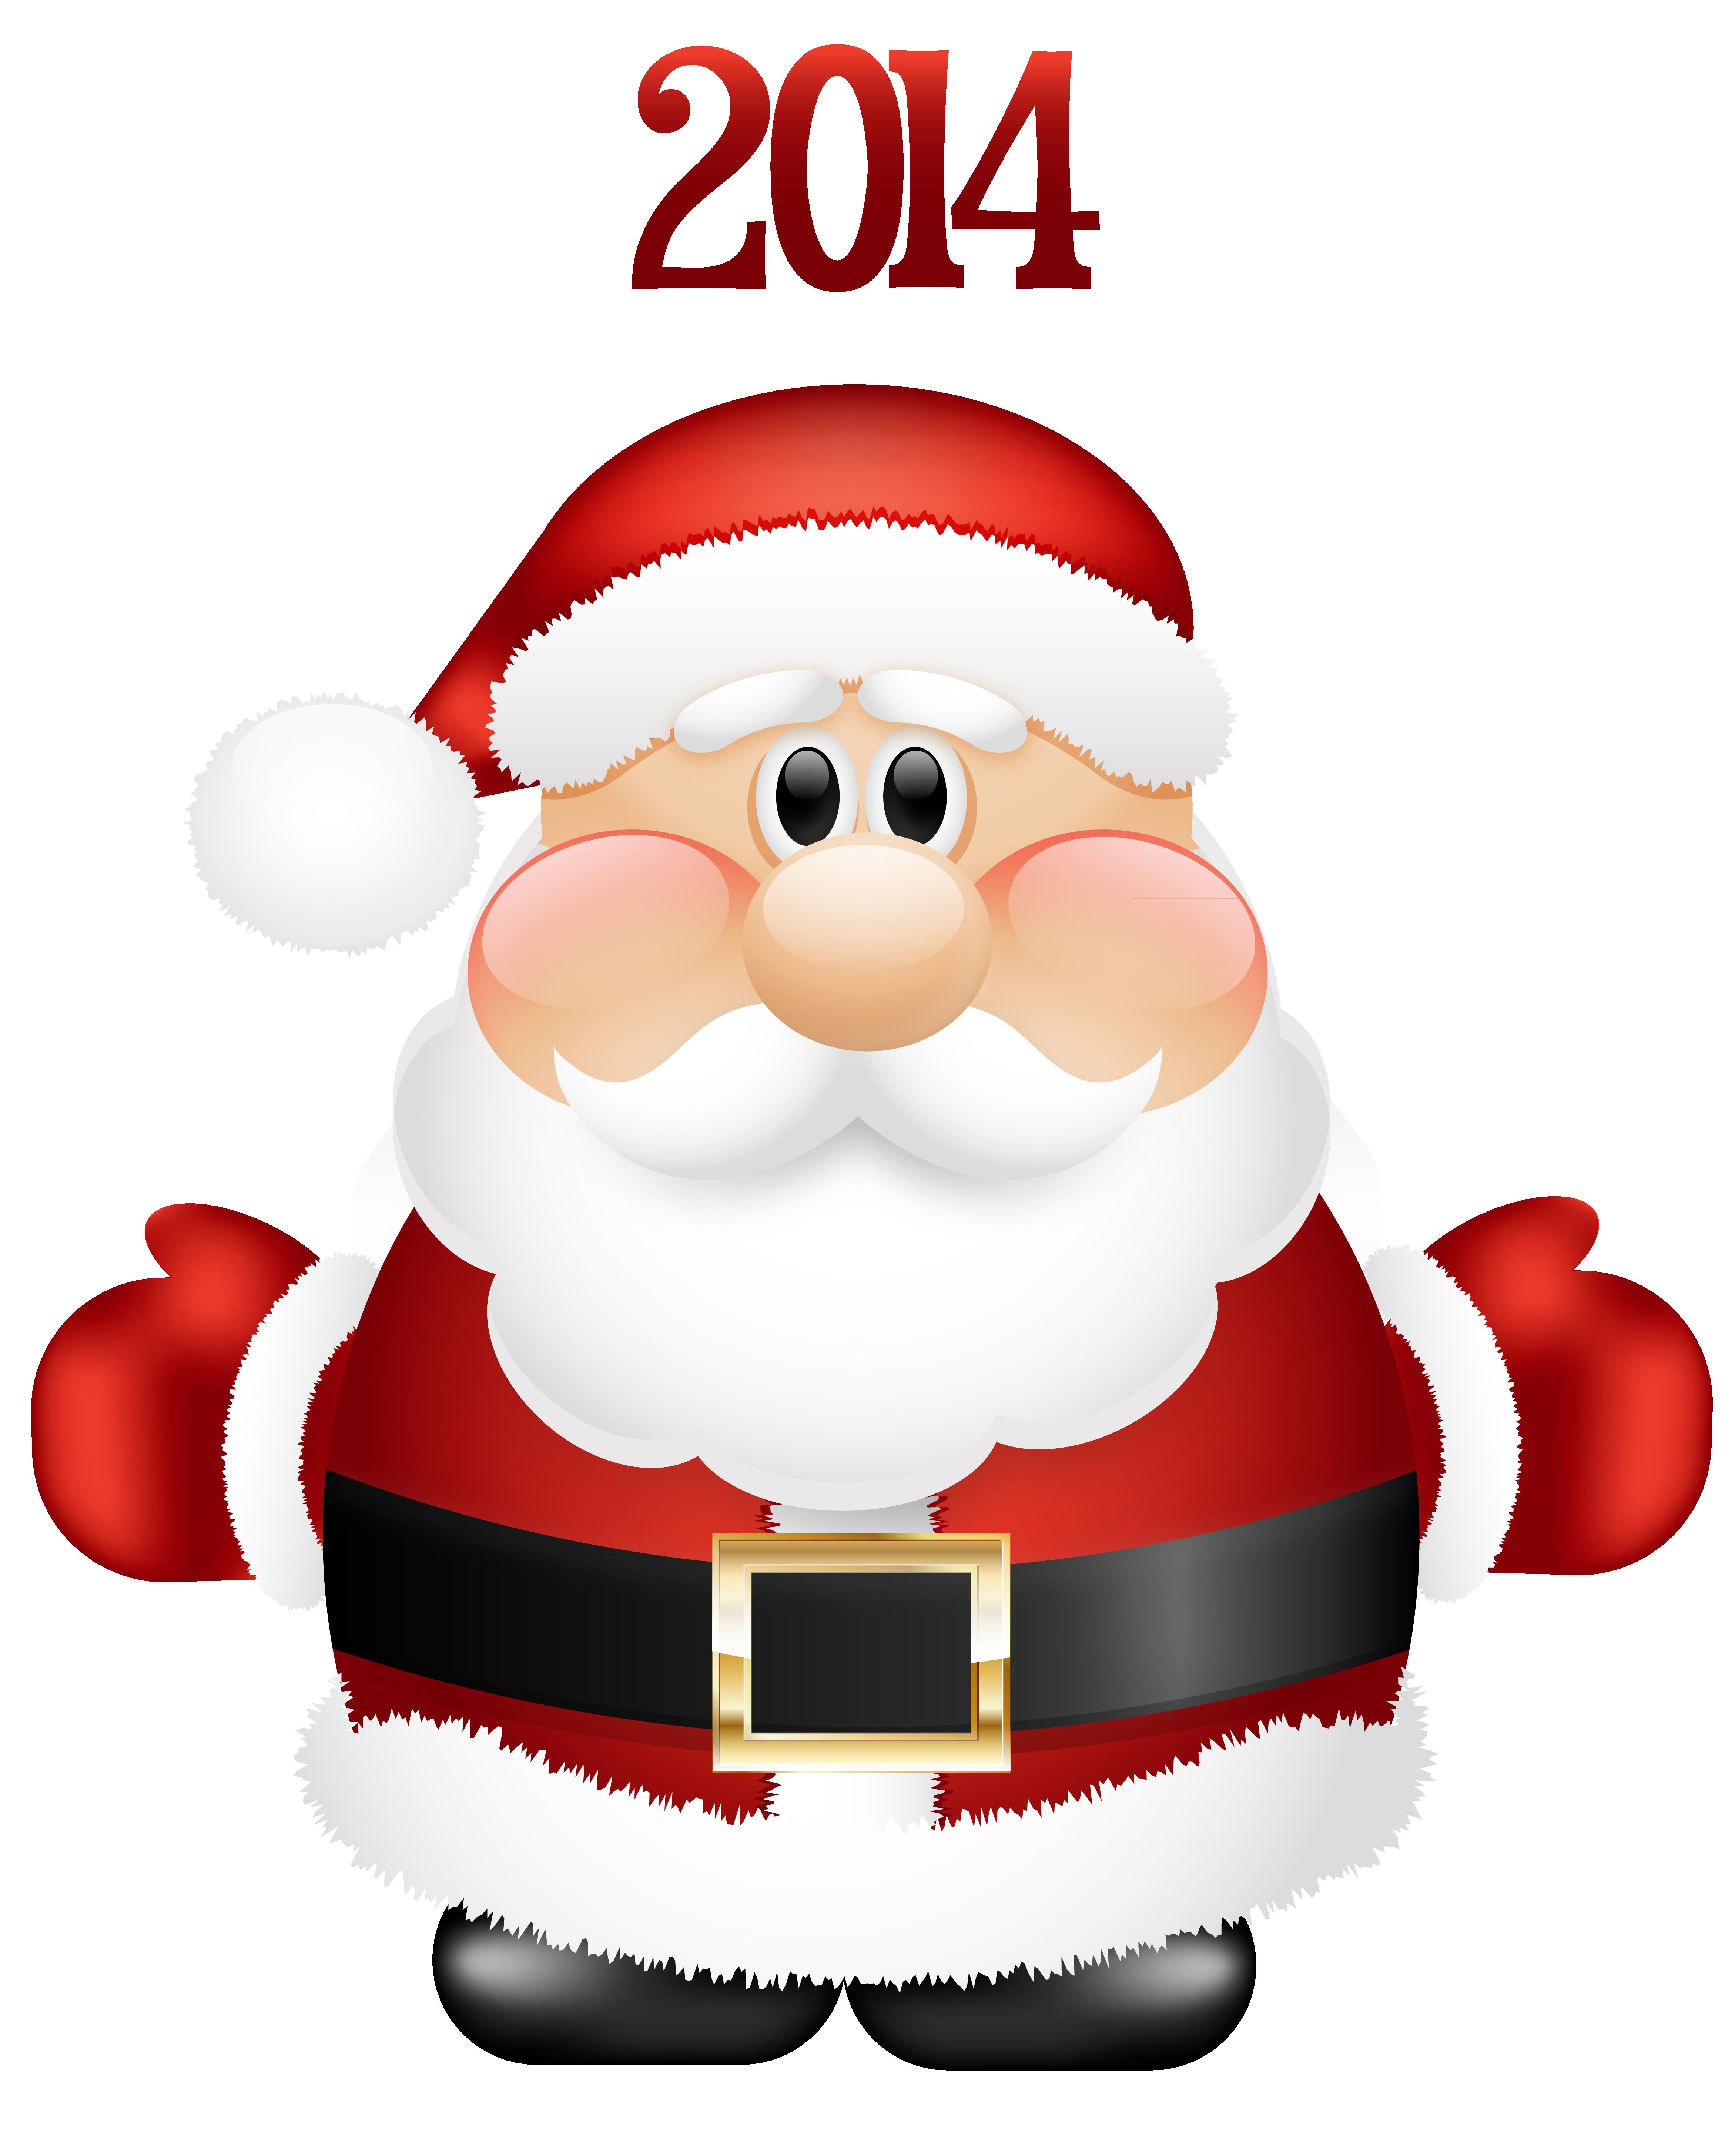 4687x5825 Transparent Cute Santa Claus 2014 Png Clipartu200b Gallery